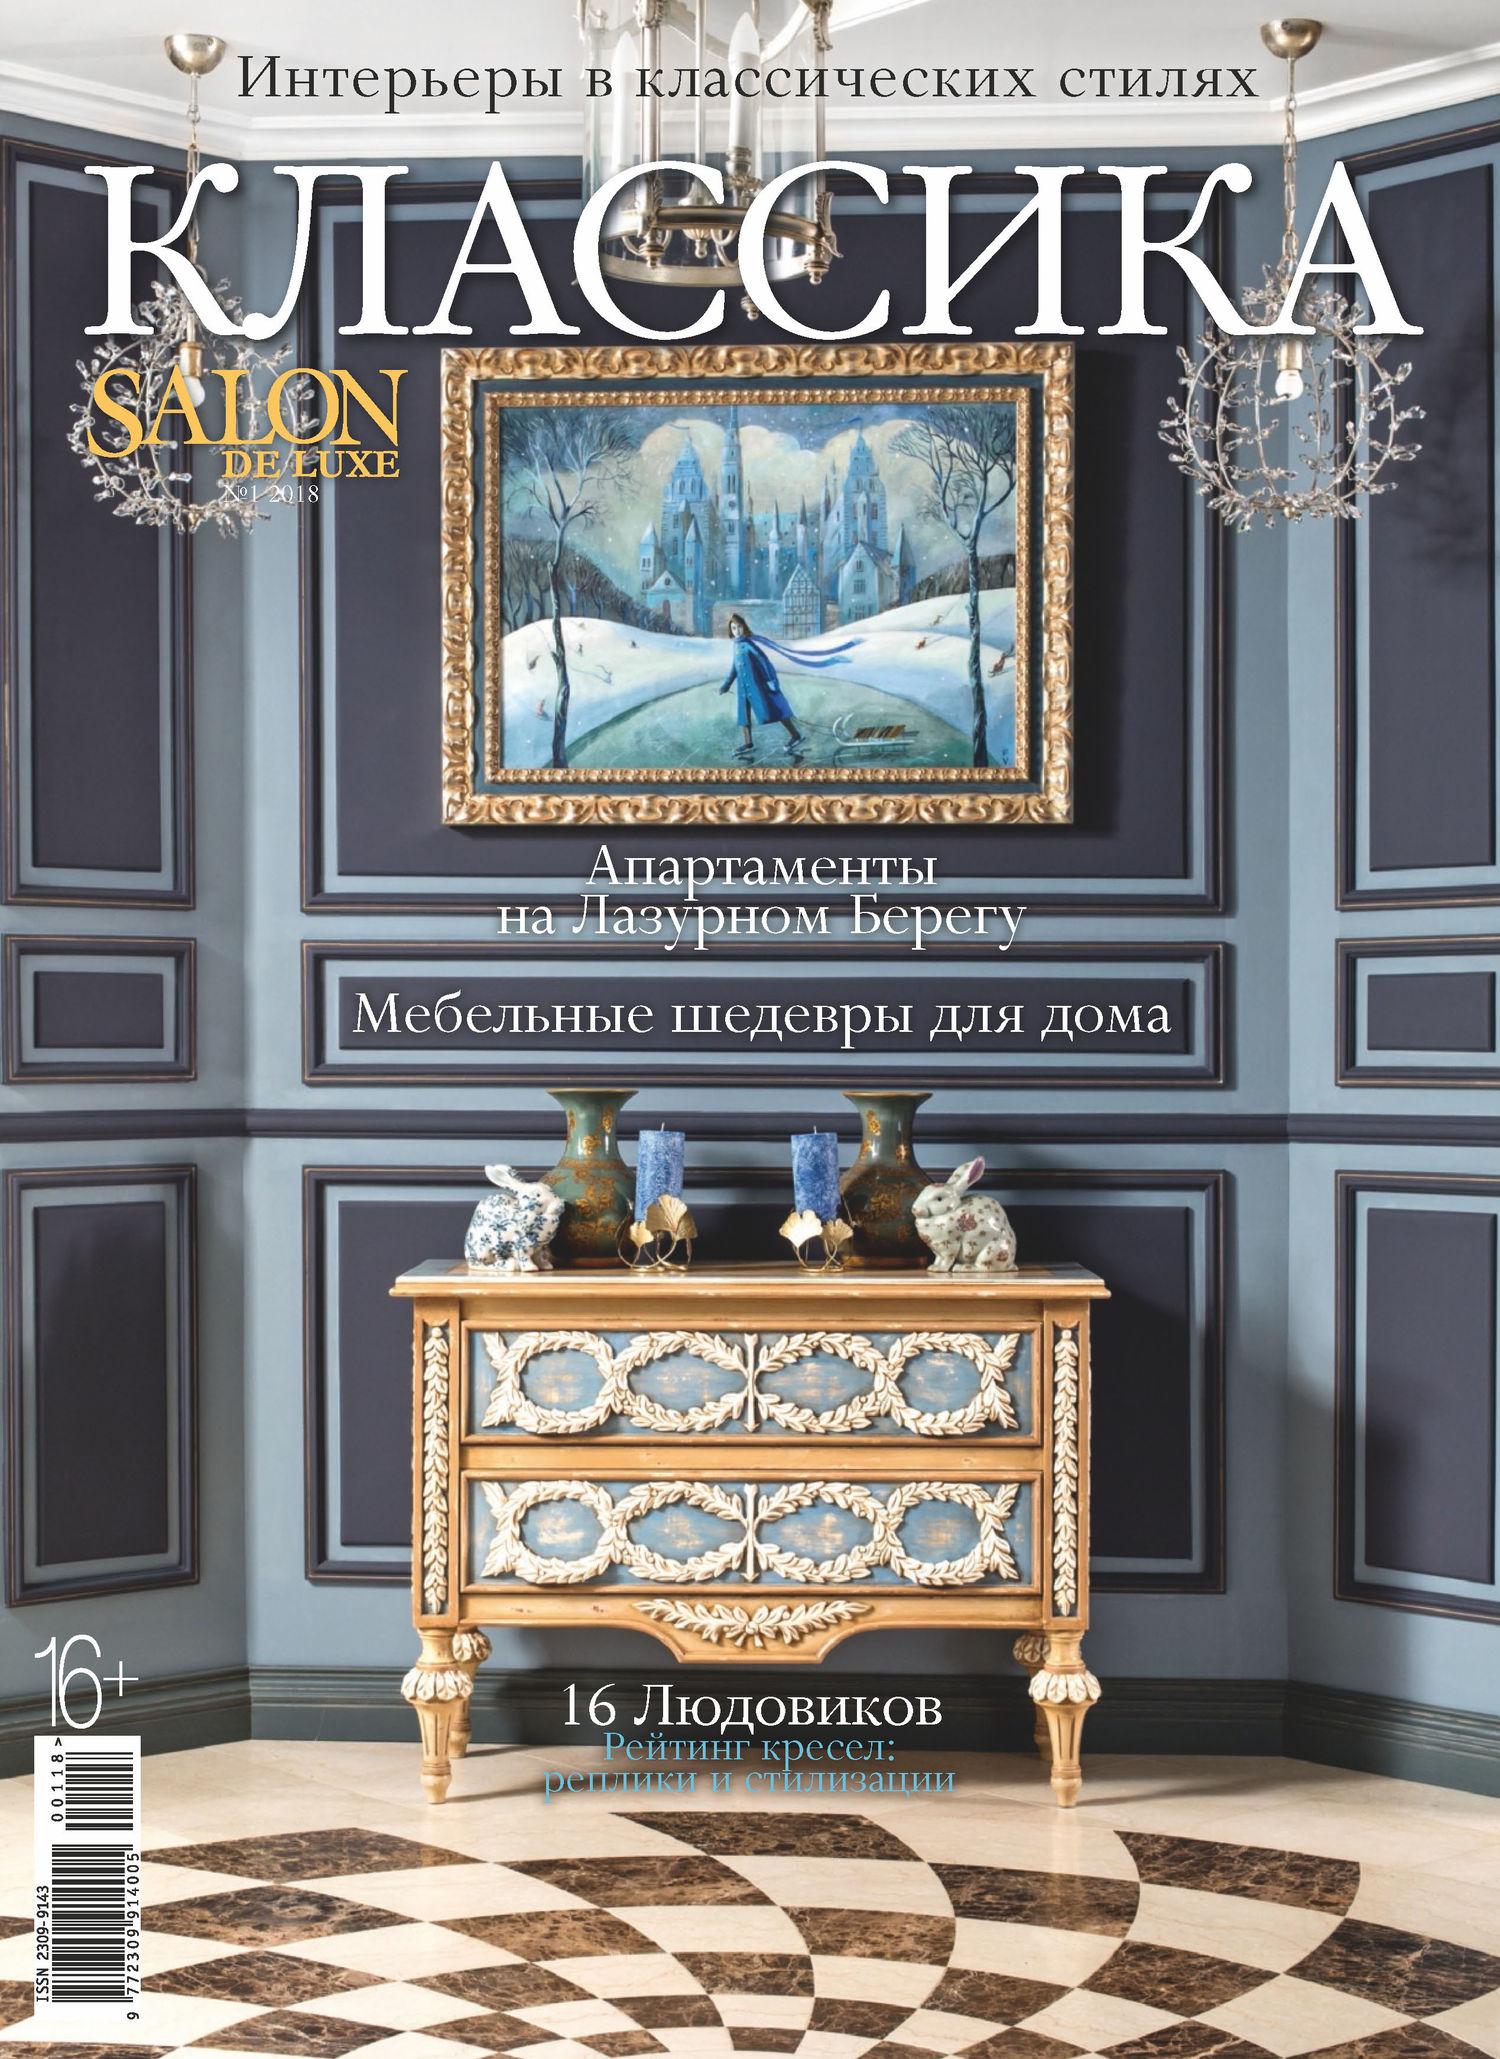 SALON de LUXE. Спецвыпуск журнала SALON-interior. №01/2018